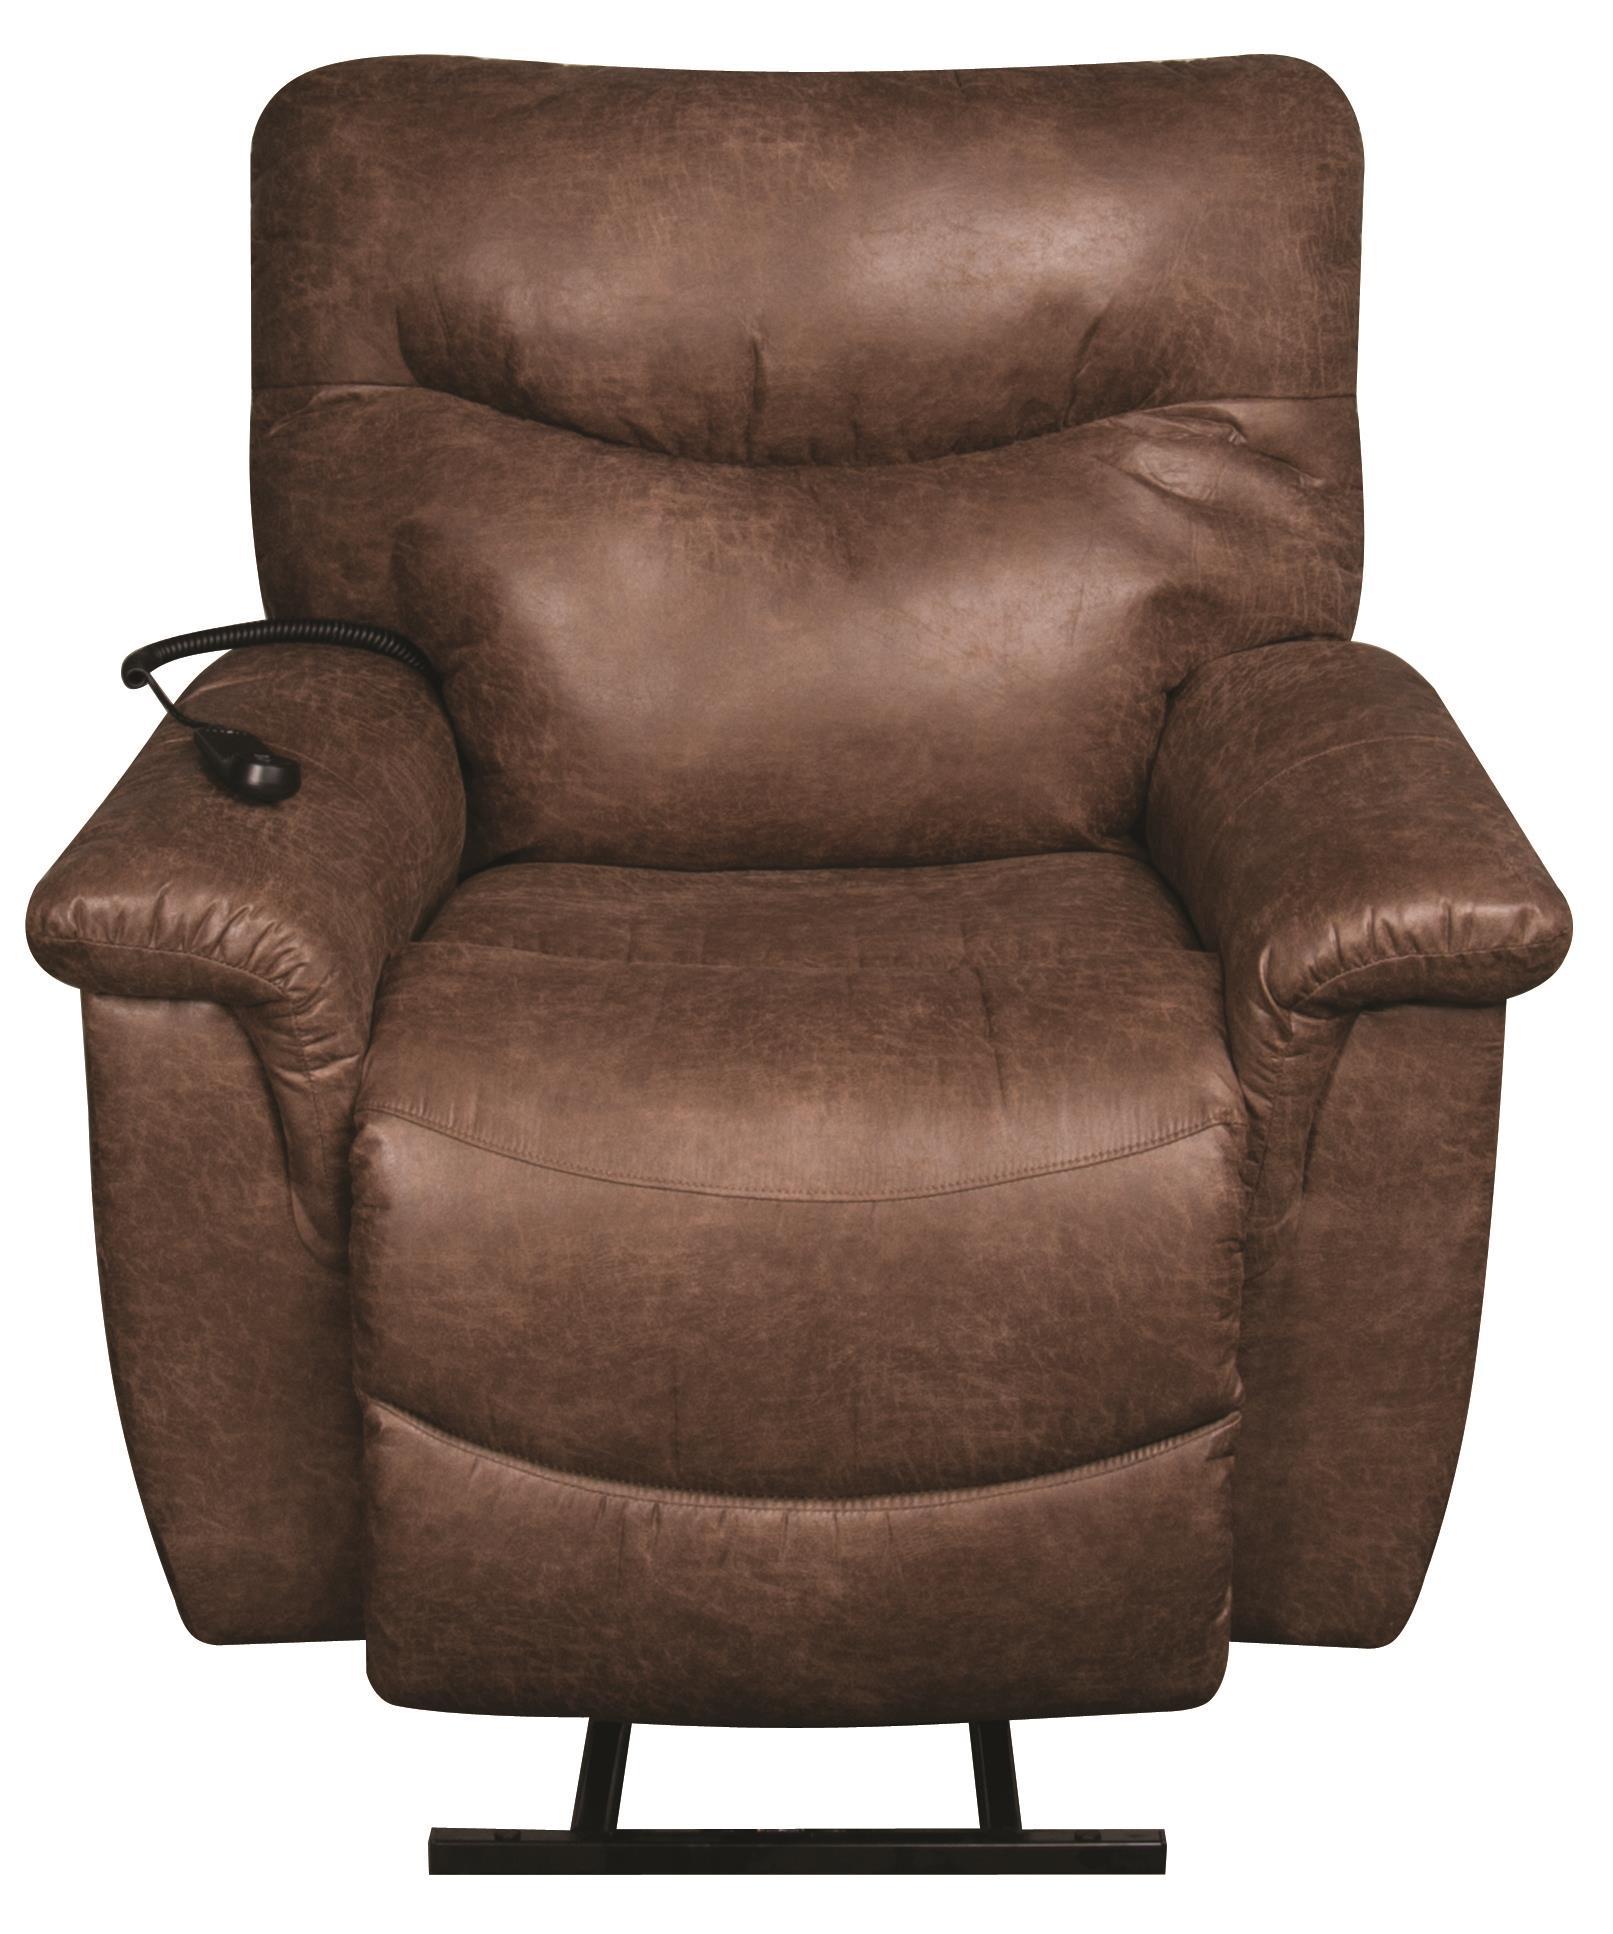 la z boy lift chair parts broda james morris home chairs